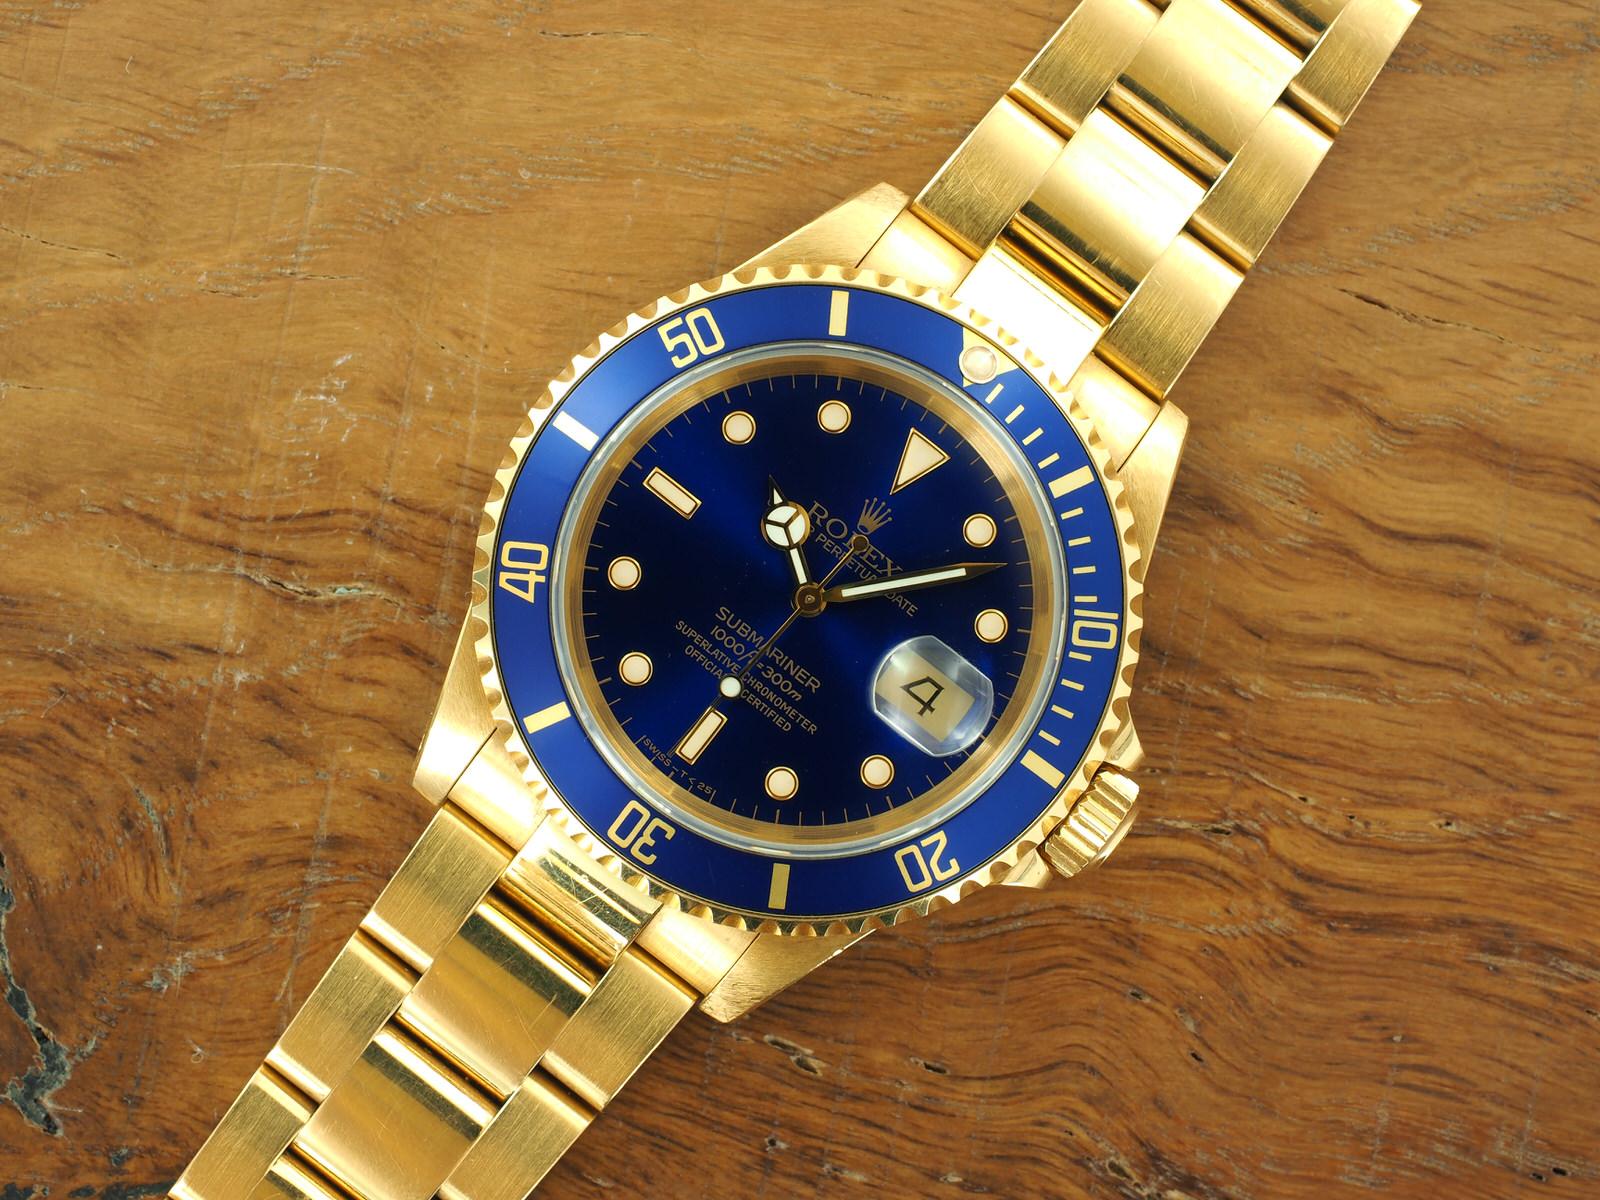 Rolex Submariner 16618 gold